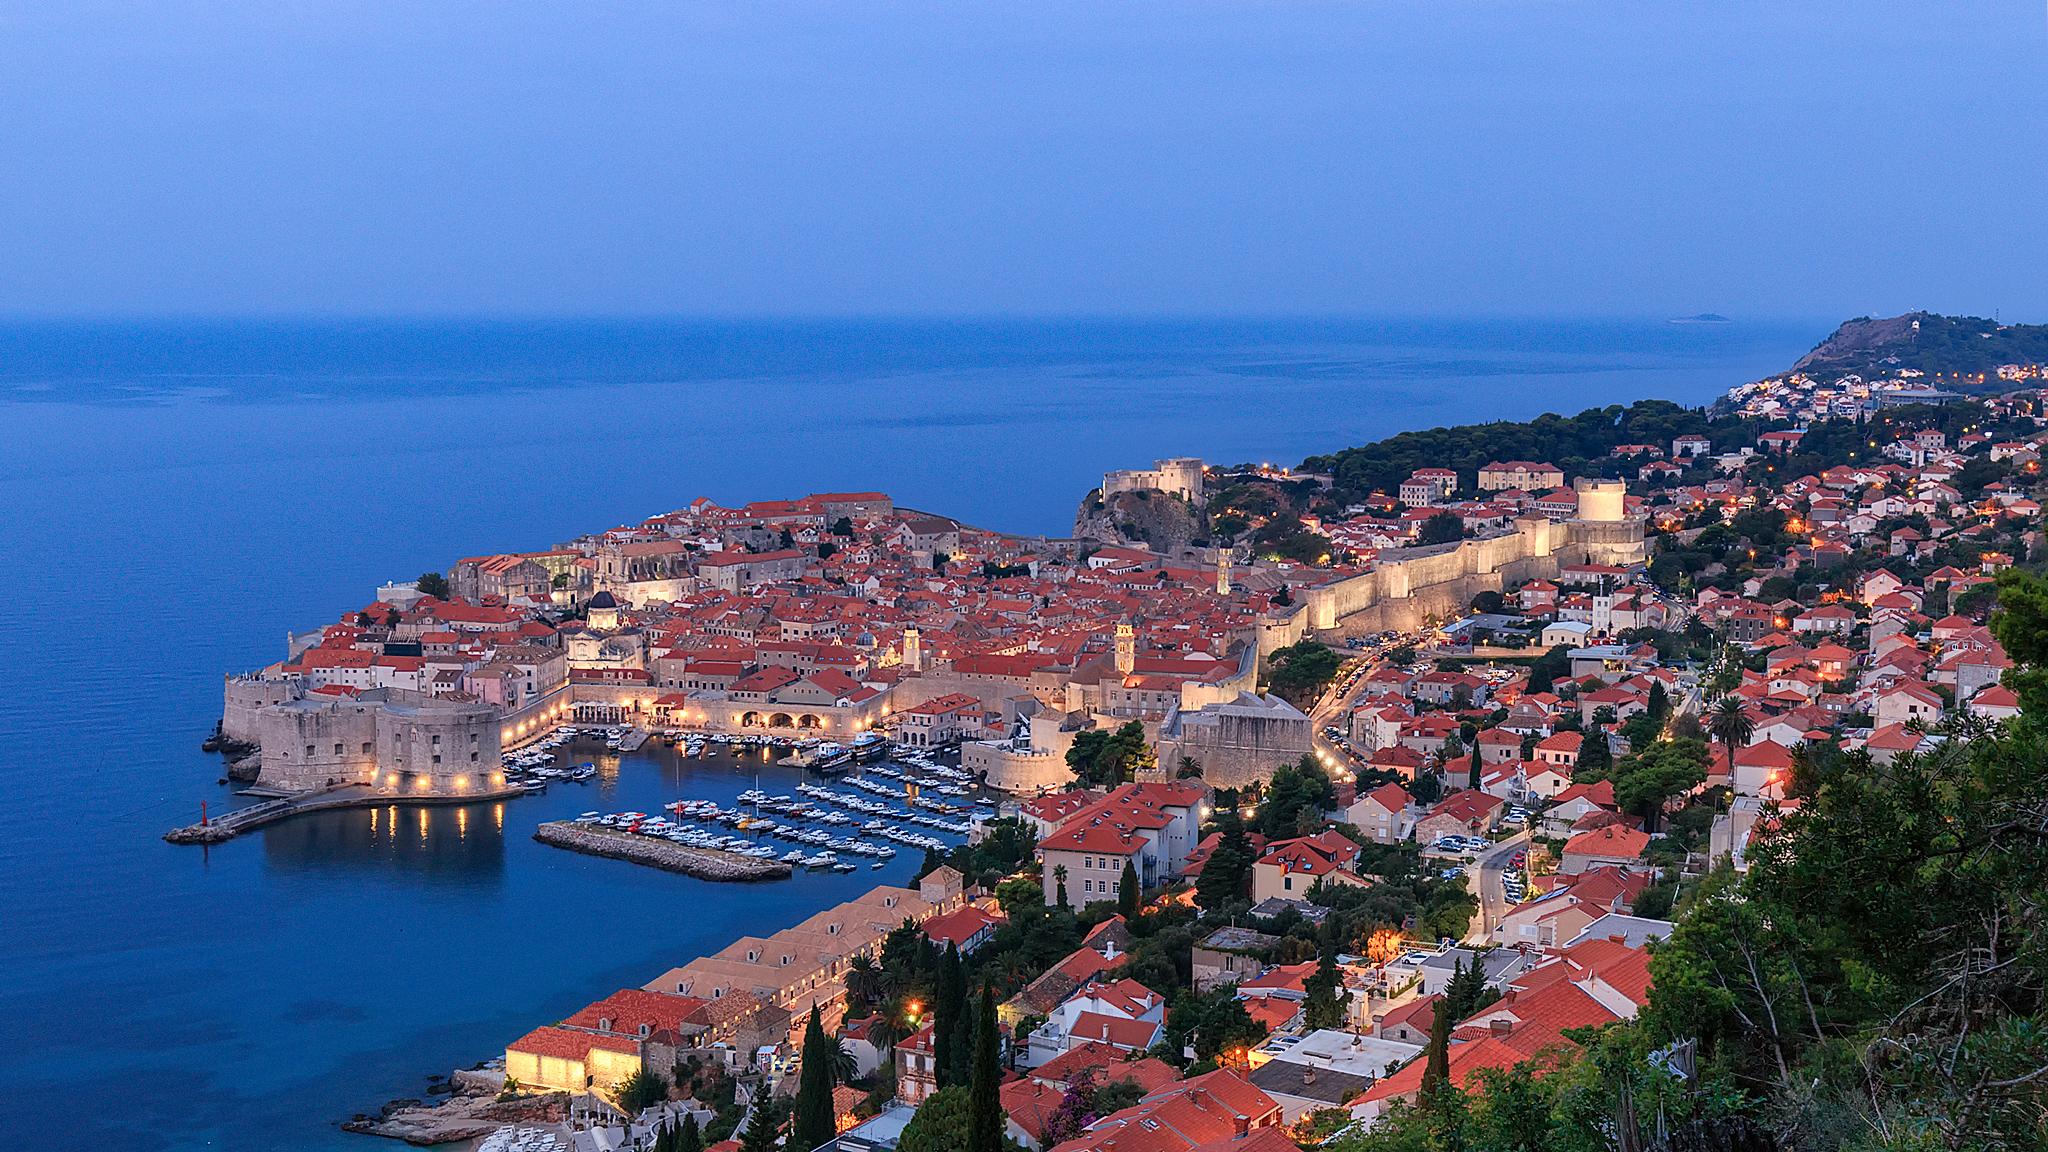 Dubrovnik Old Town View, Croatia